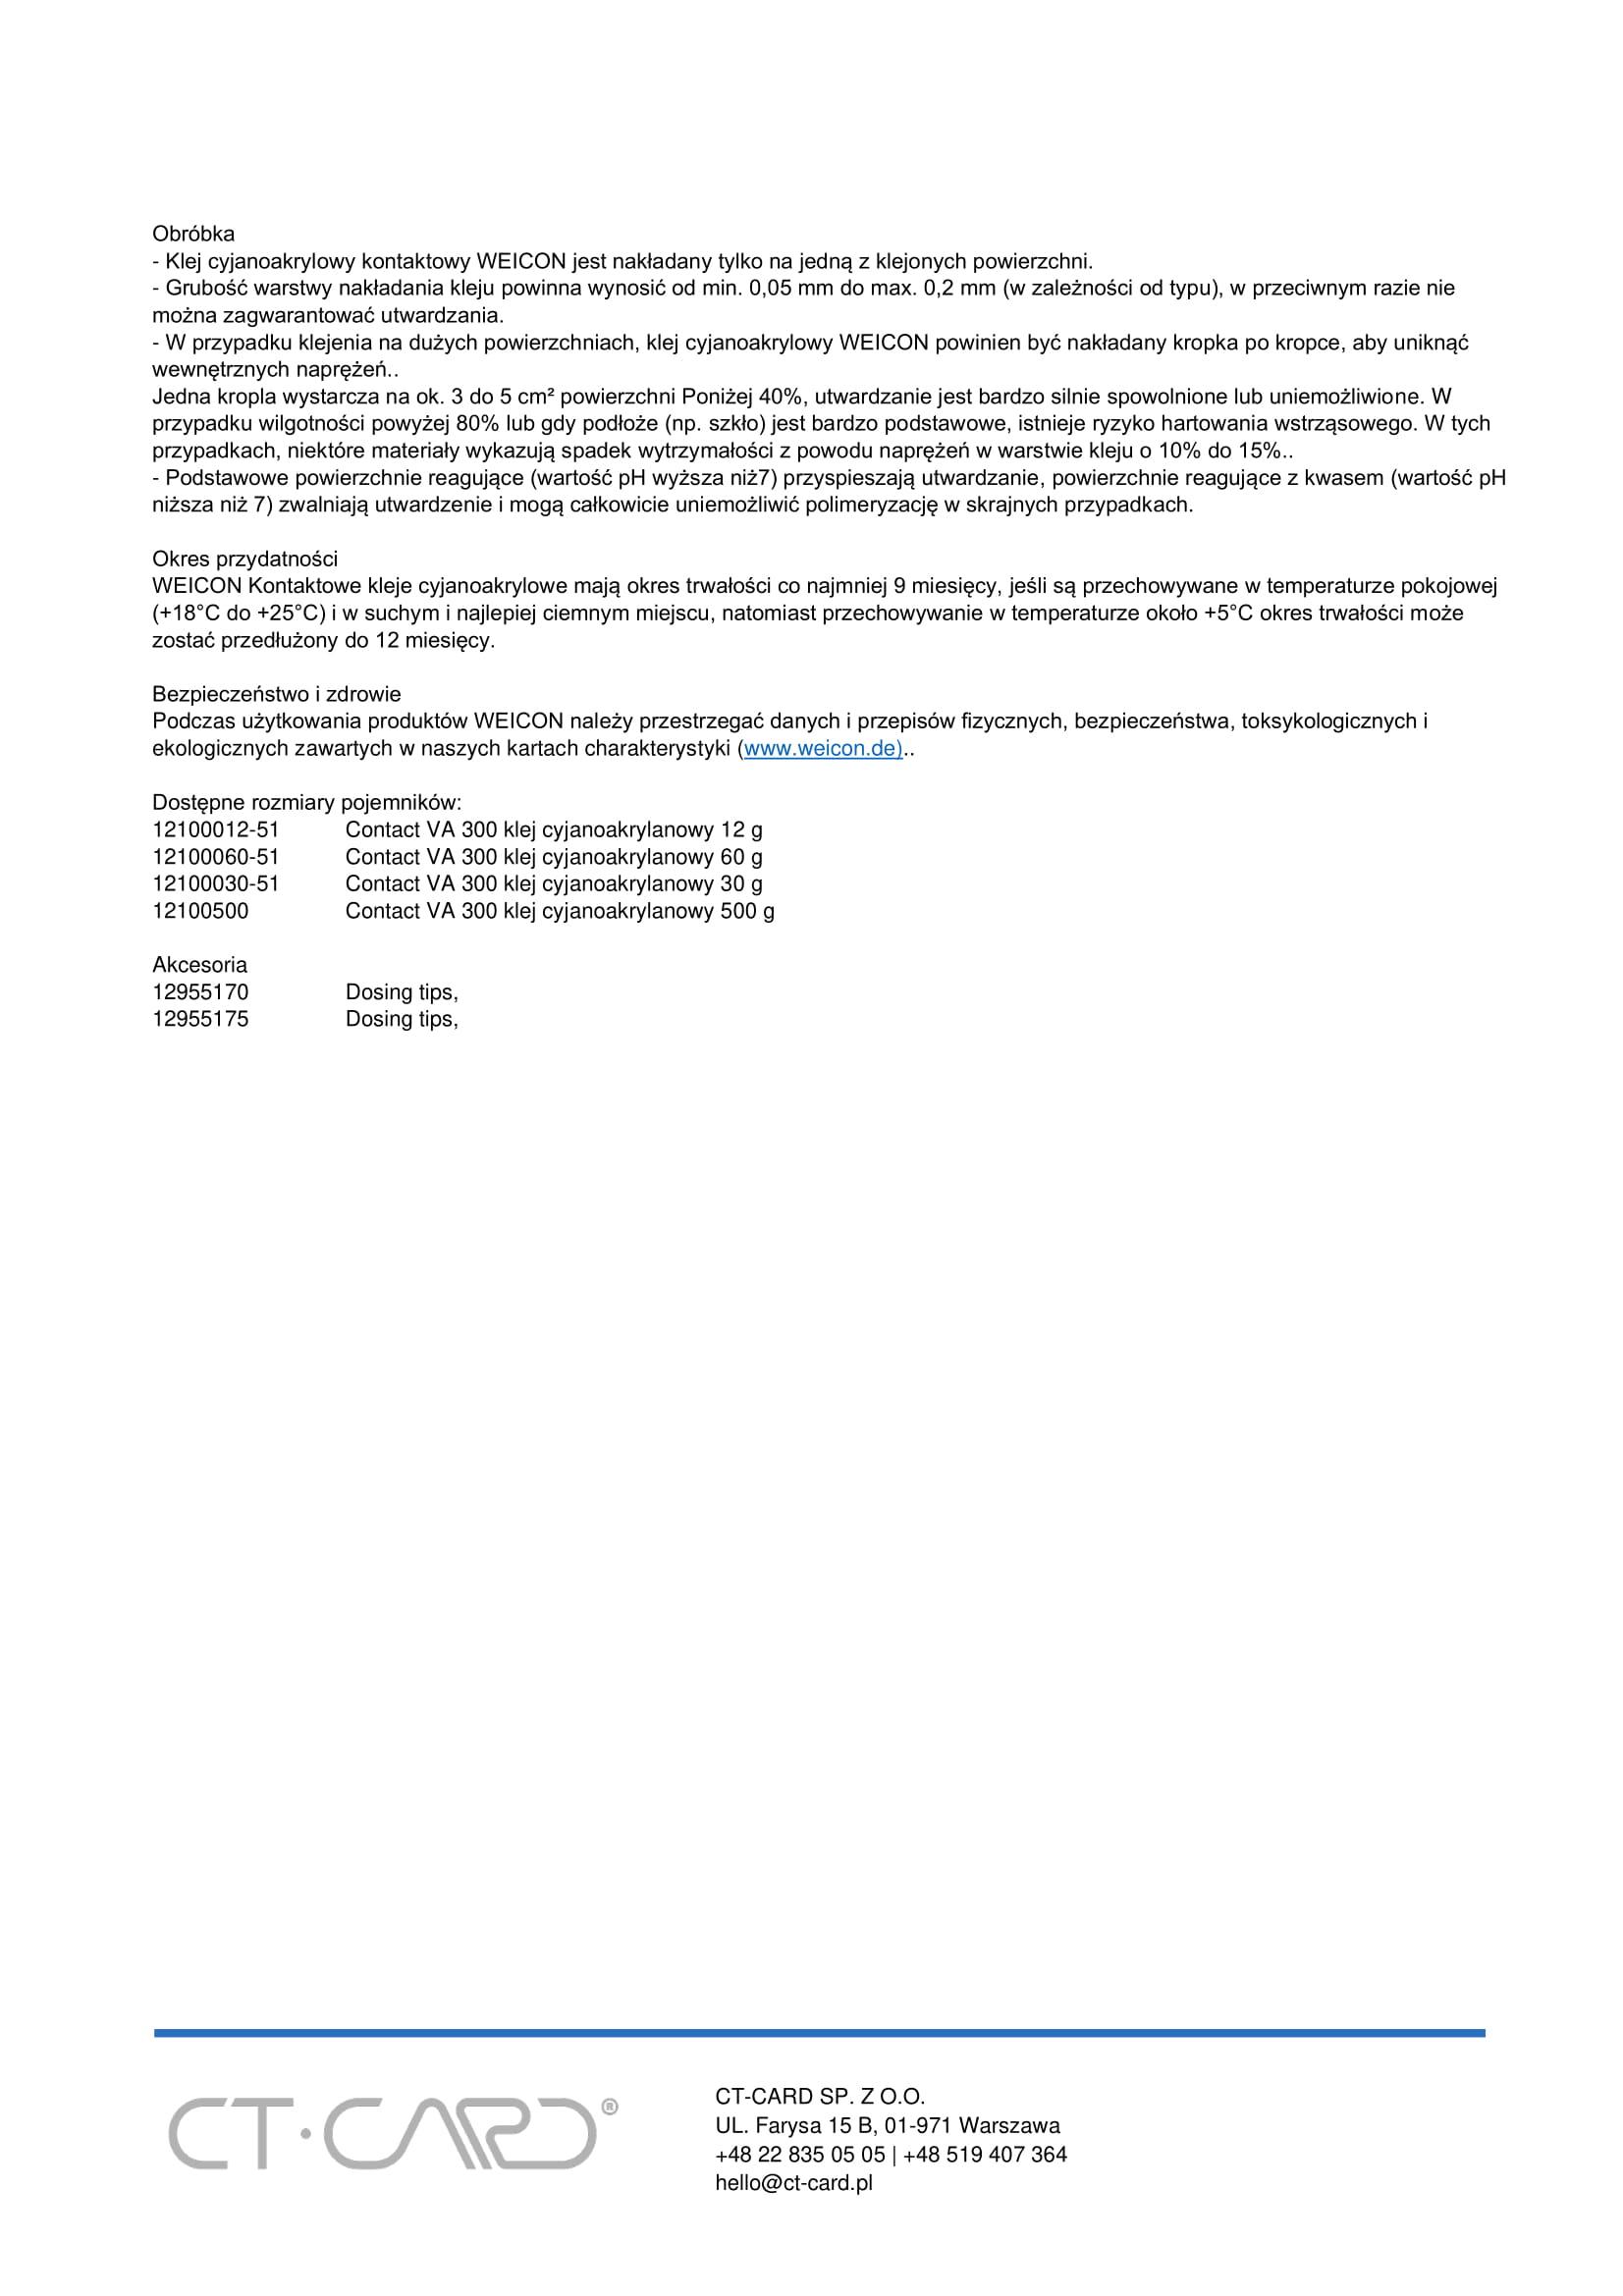 Contact VA 300 klej cyjanoakrylanowy-2